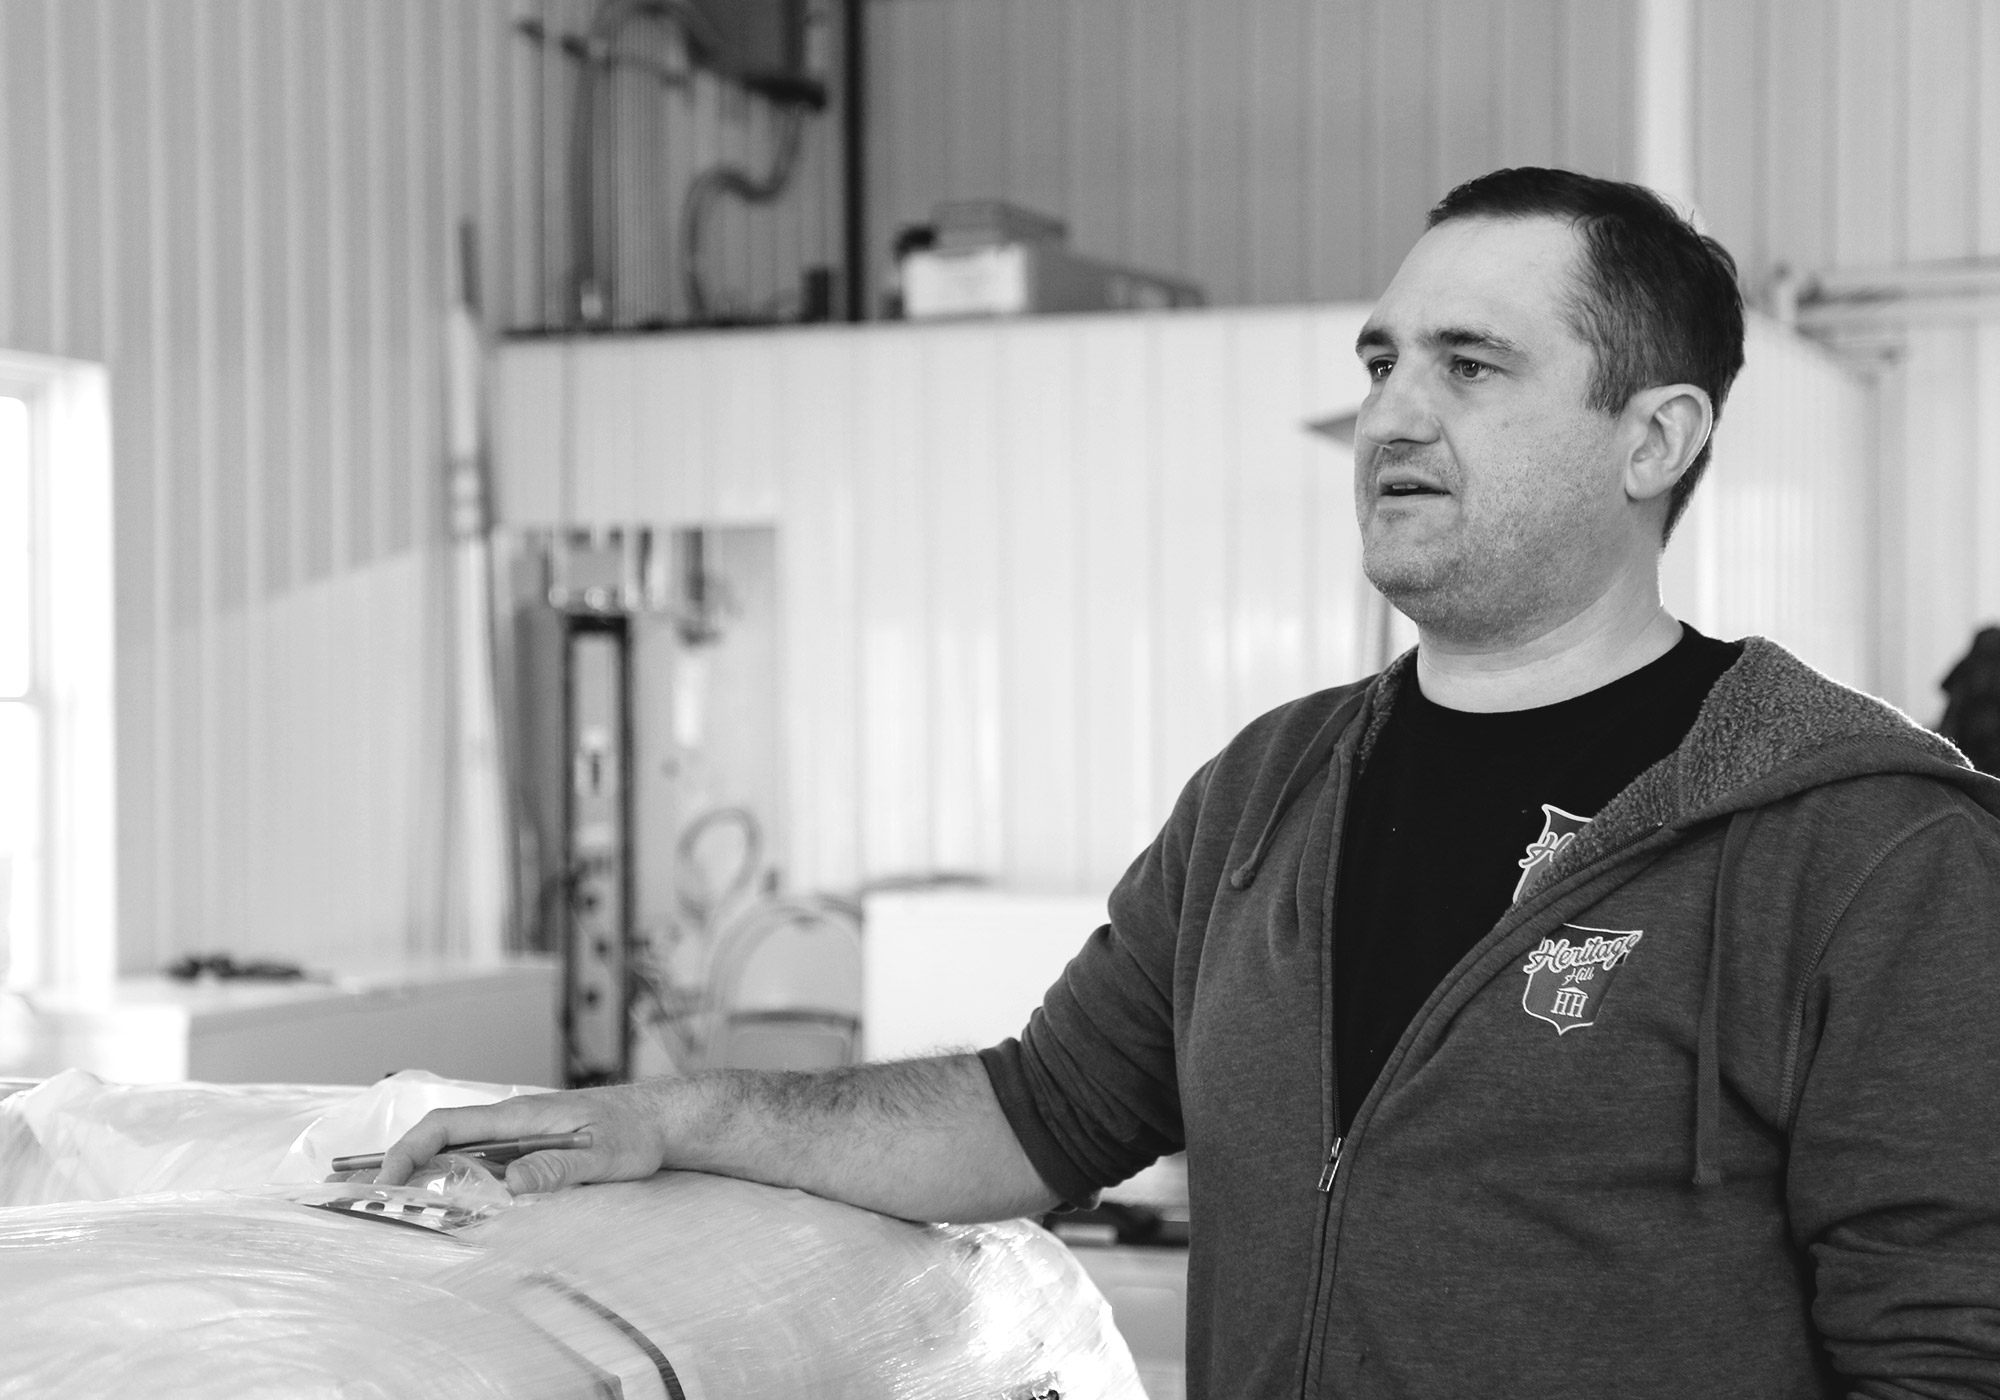 Heritage Hill Brewery (and Palladino Farms) owner, Dan Palladino